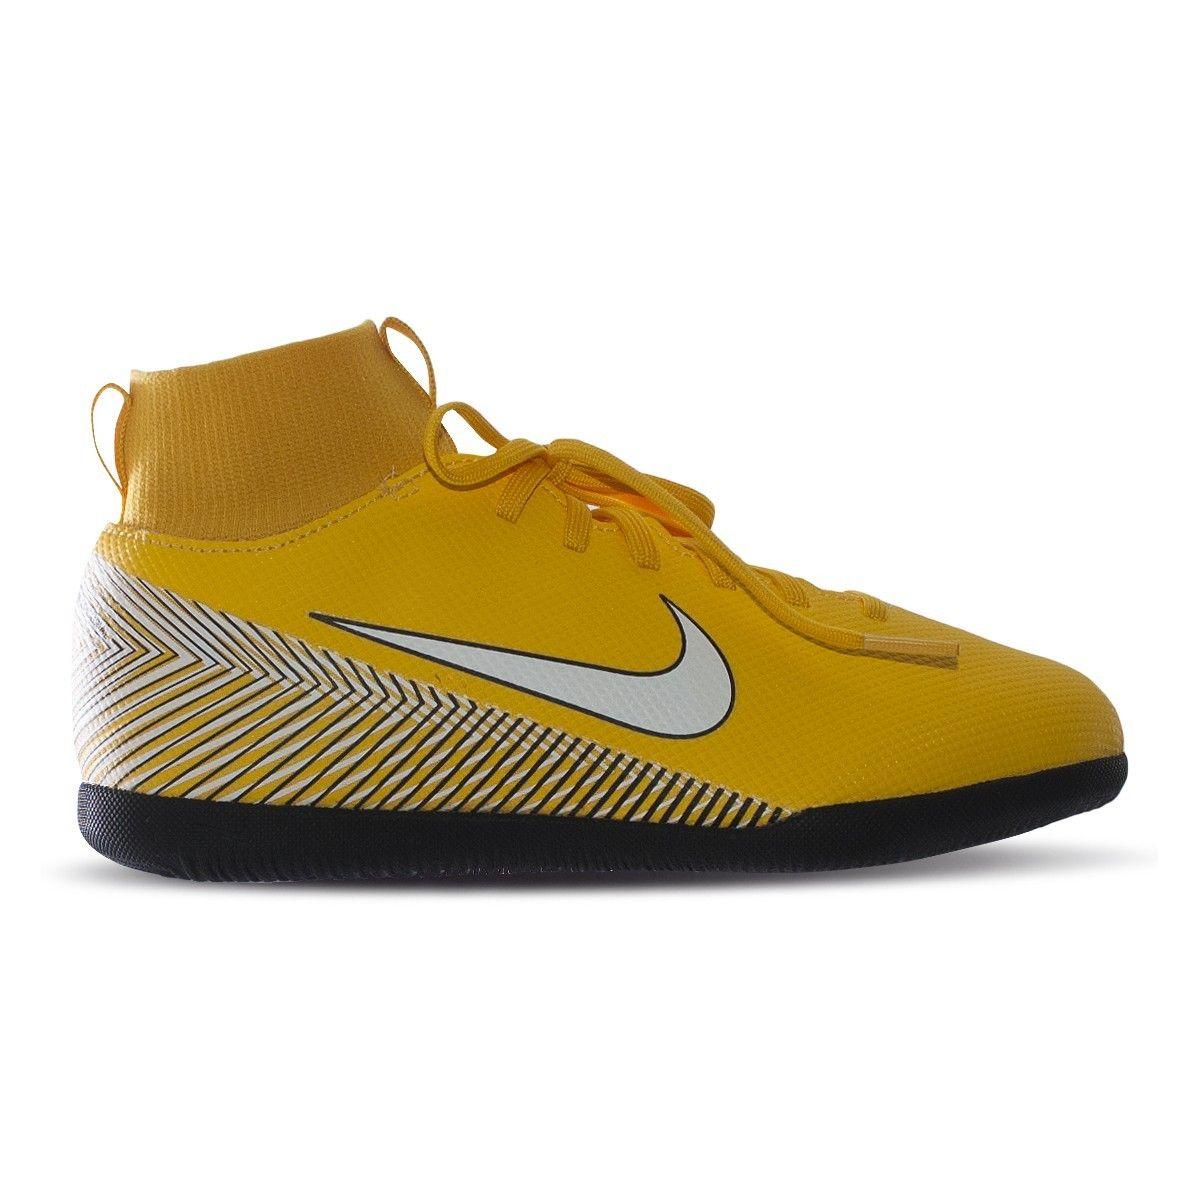 712a5bfa97 Chuteira Futsal Nike Superfly VI Neymar